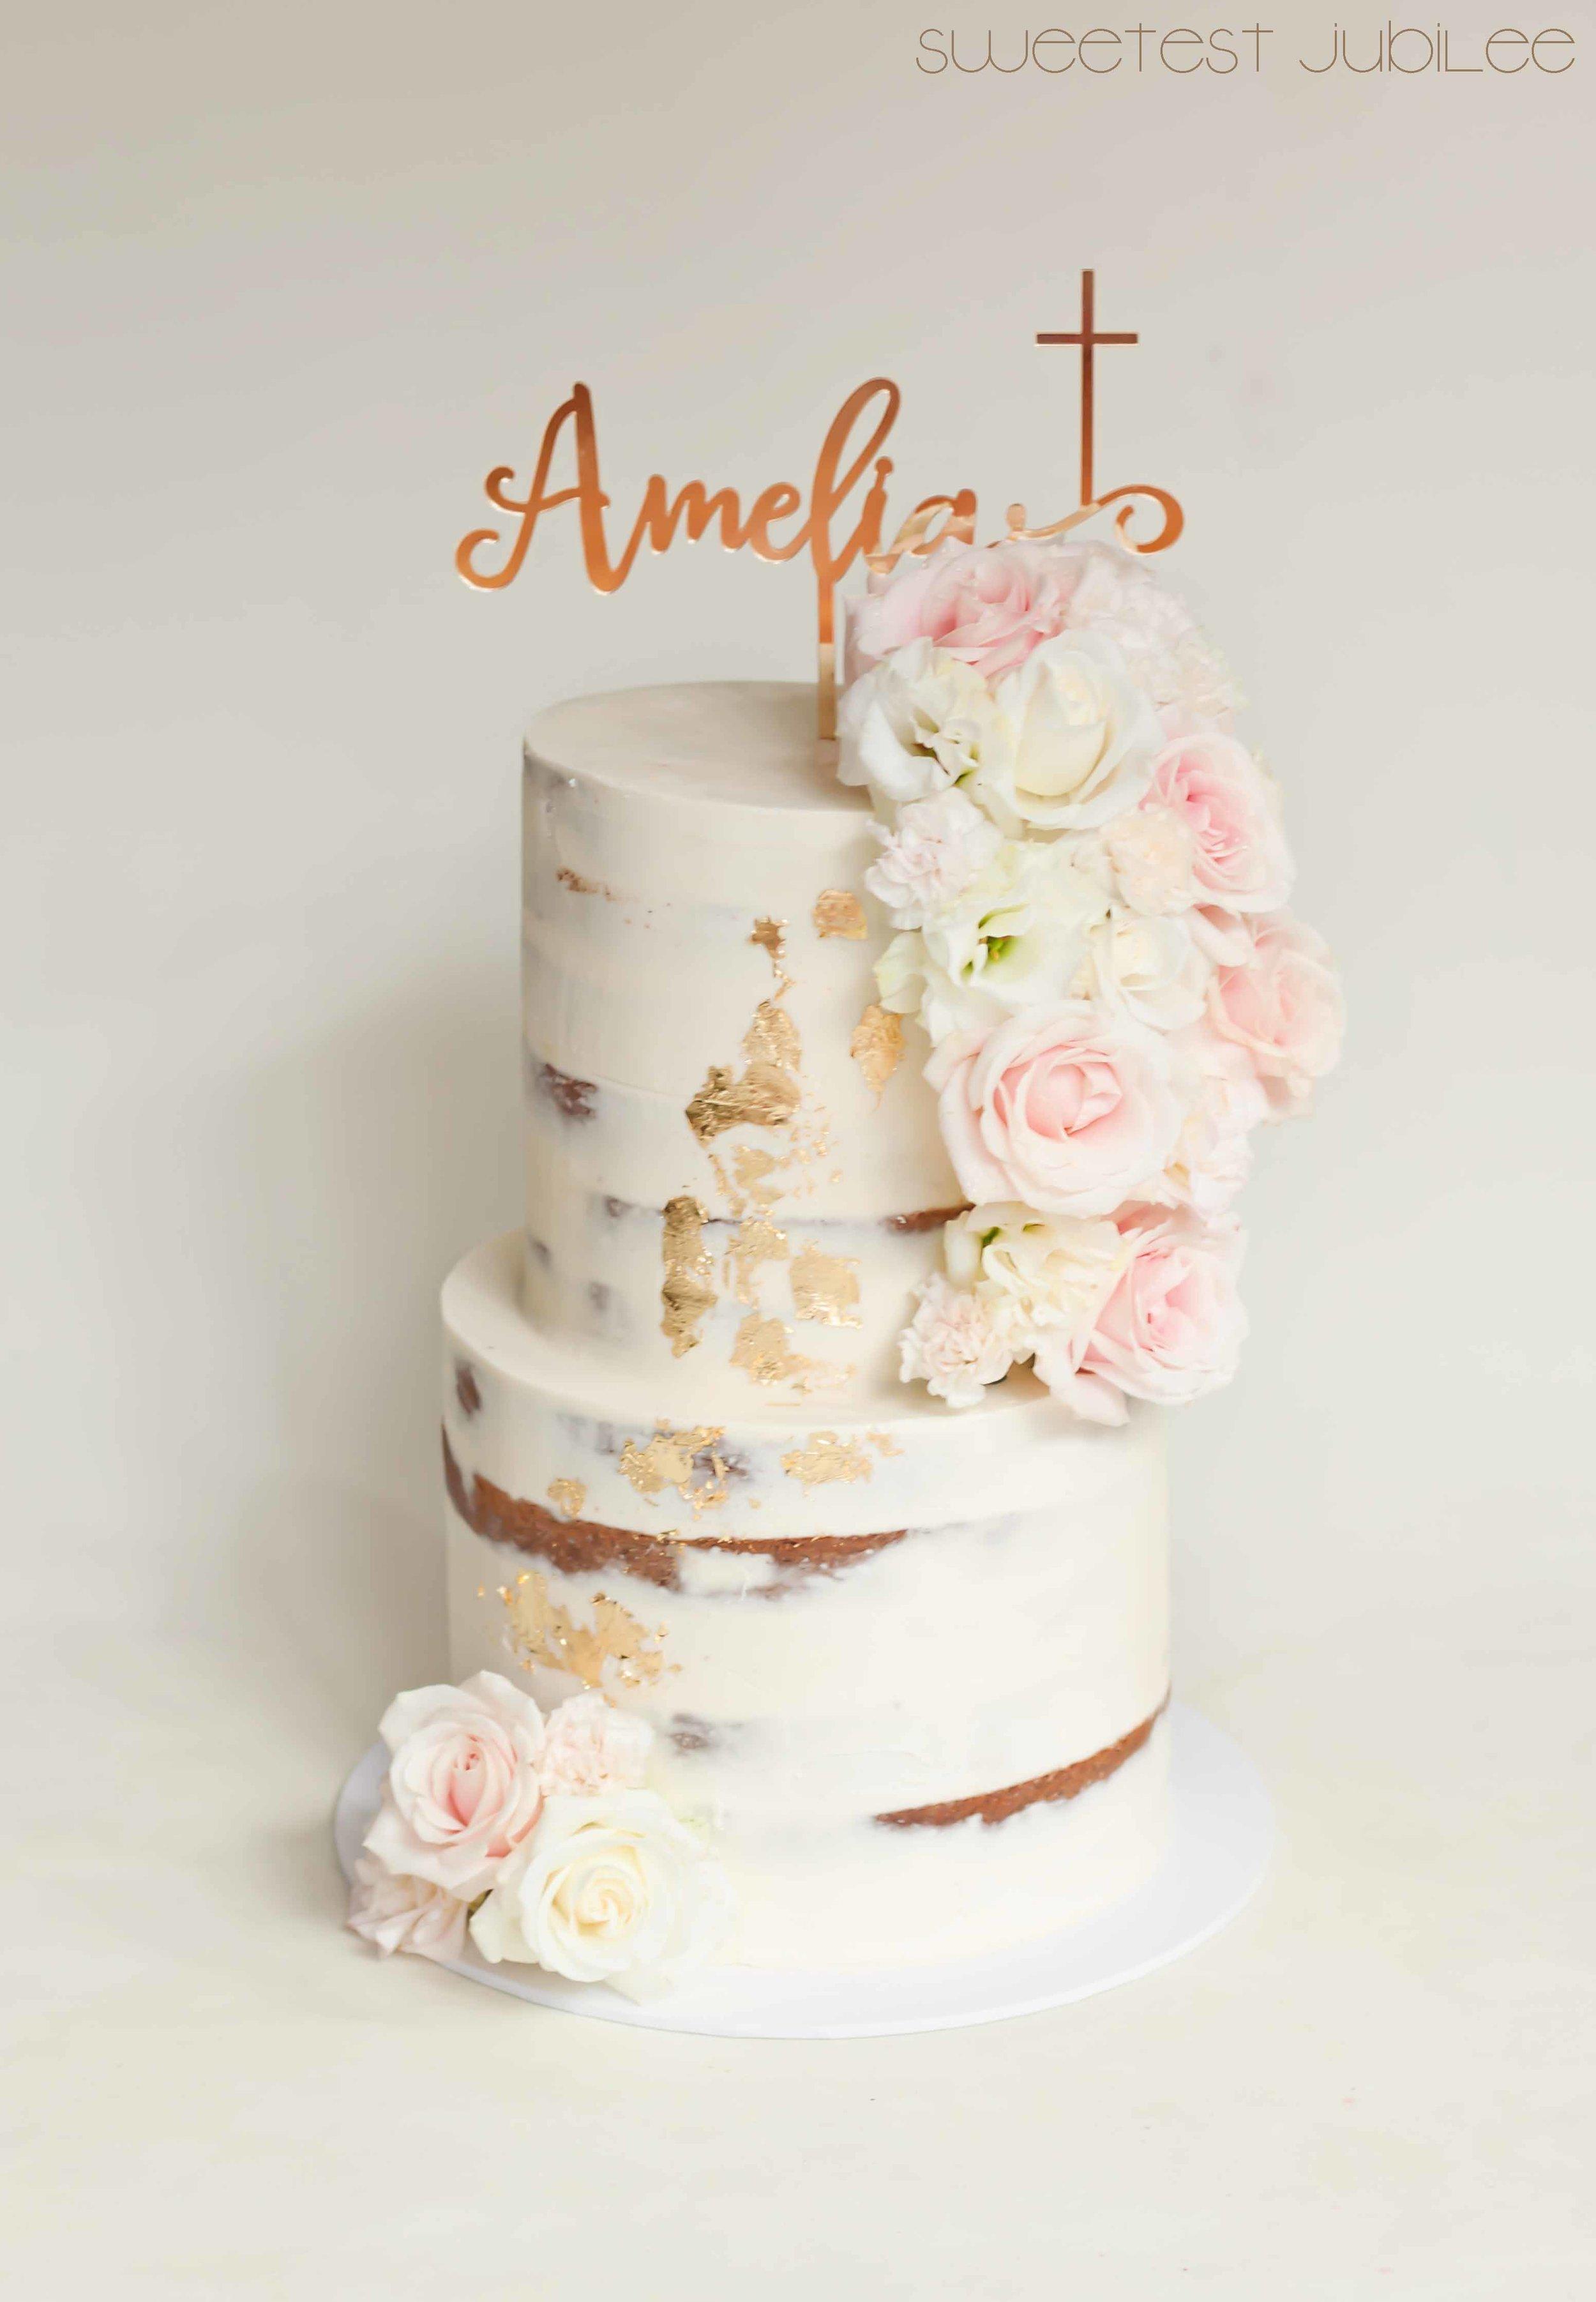 Amelia christening cake.jpg